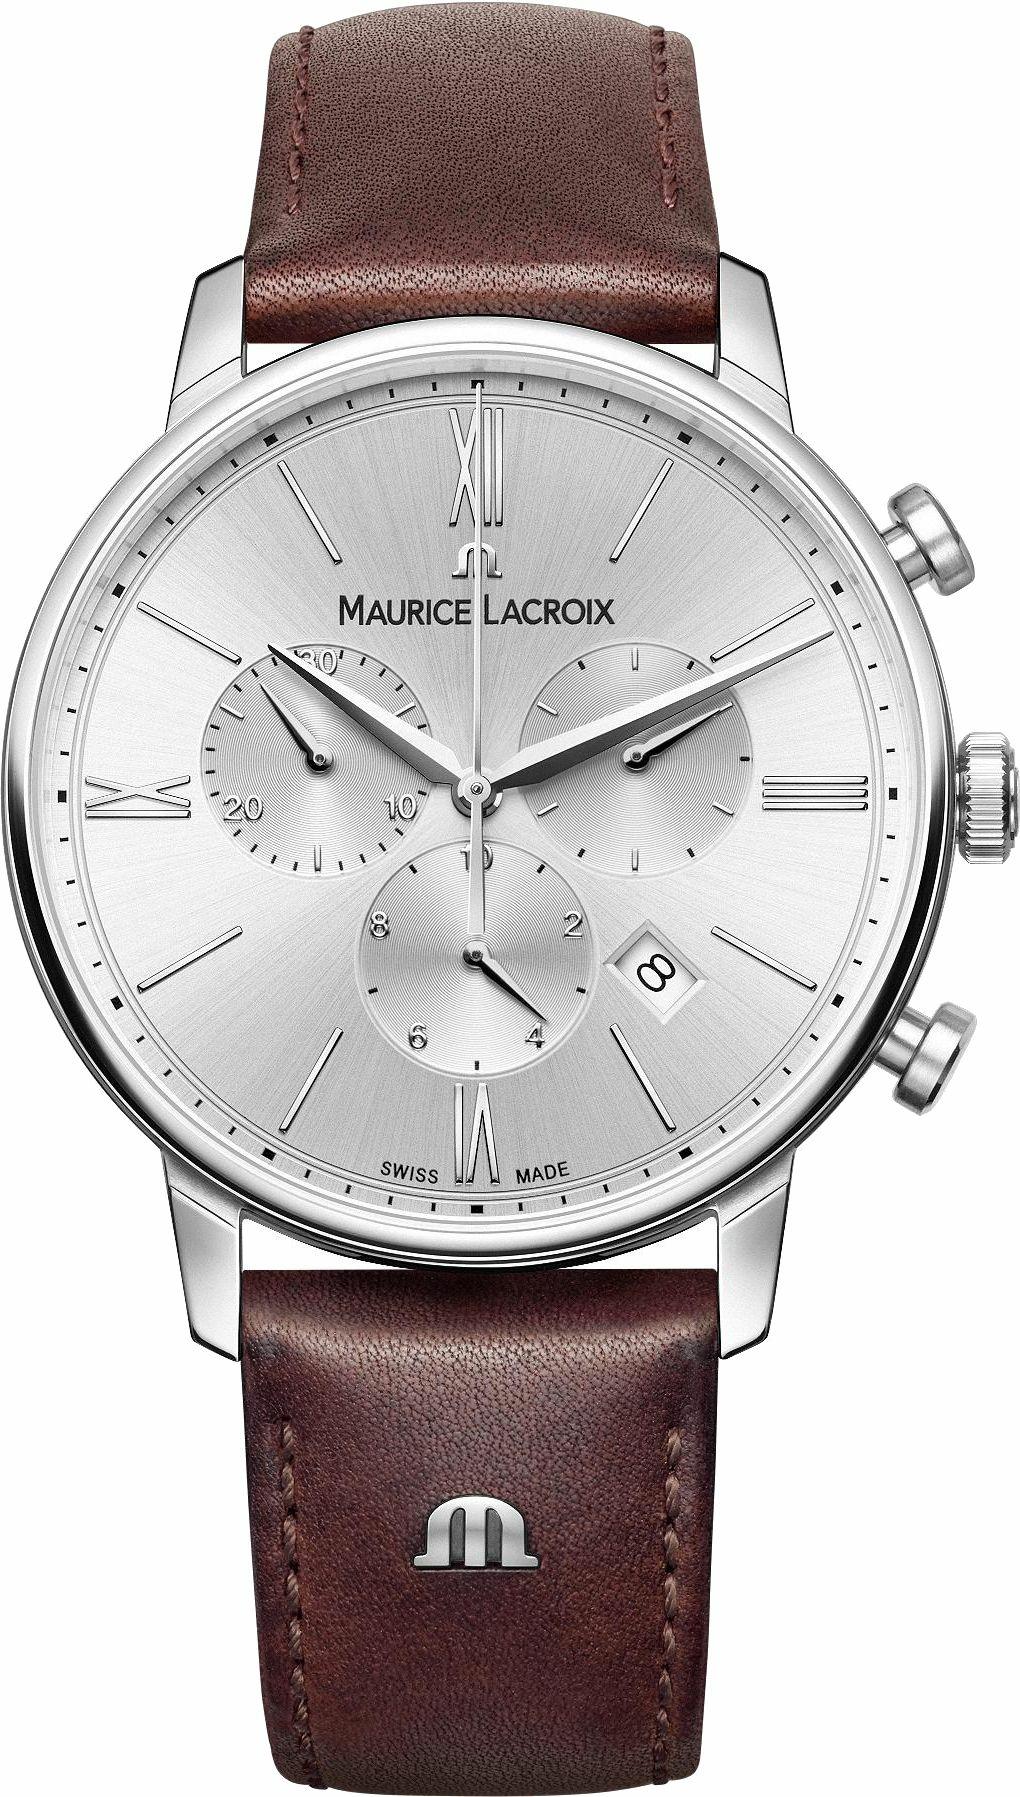 Ss001 110 Chronographe HerrenuhrEl1098 1 Lacroix Eliros Maurice UGjzVqSpLM